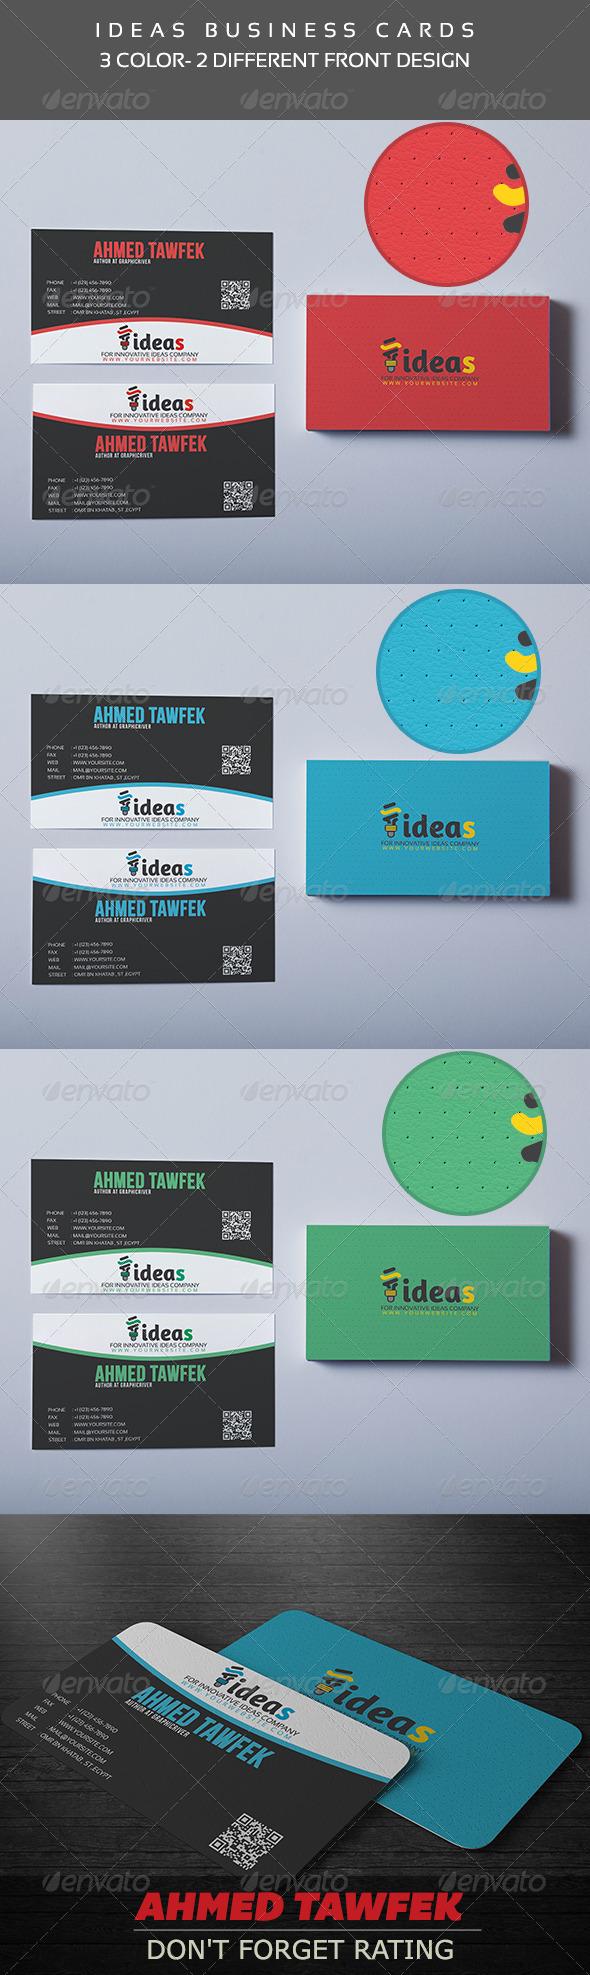 GraphicRiver Ideas Business Cards 4418854